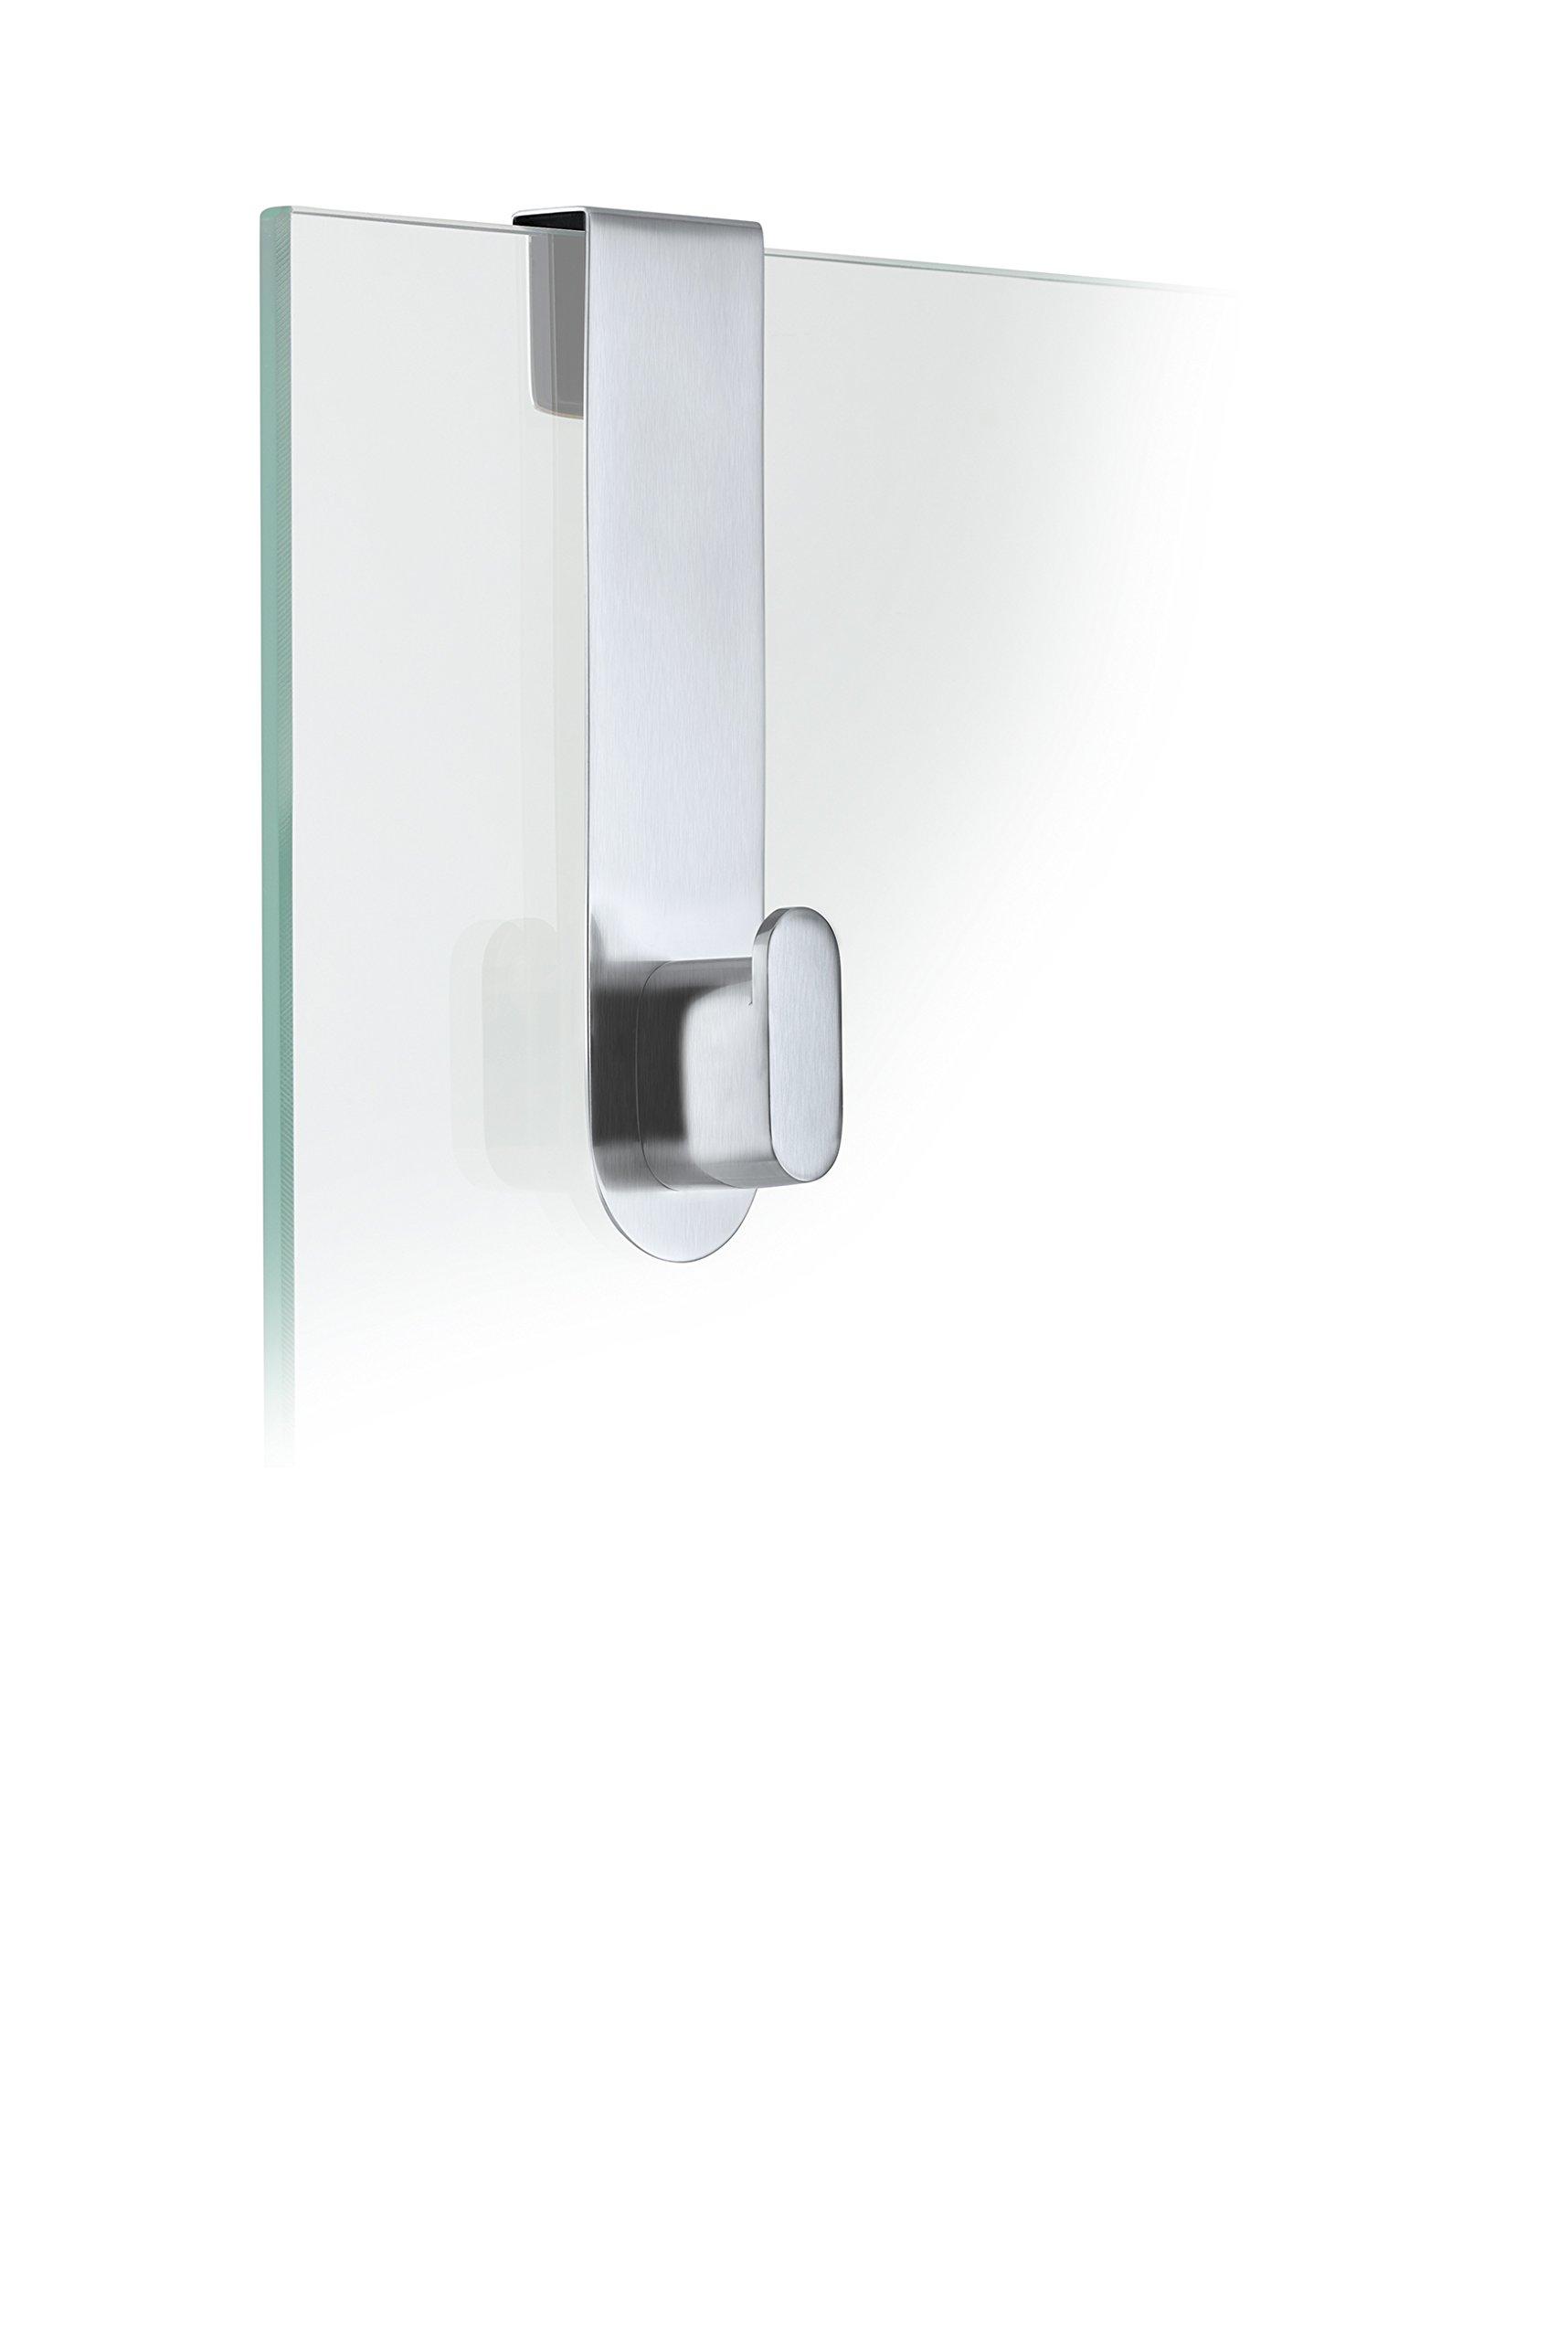 Blomus 68905 Areo Glass Door Shower Hook, Brushed by Blomus (Image #1)